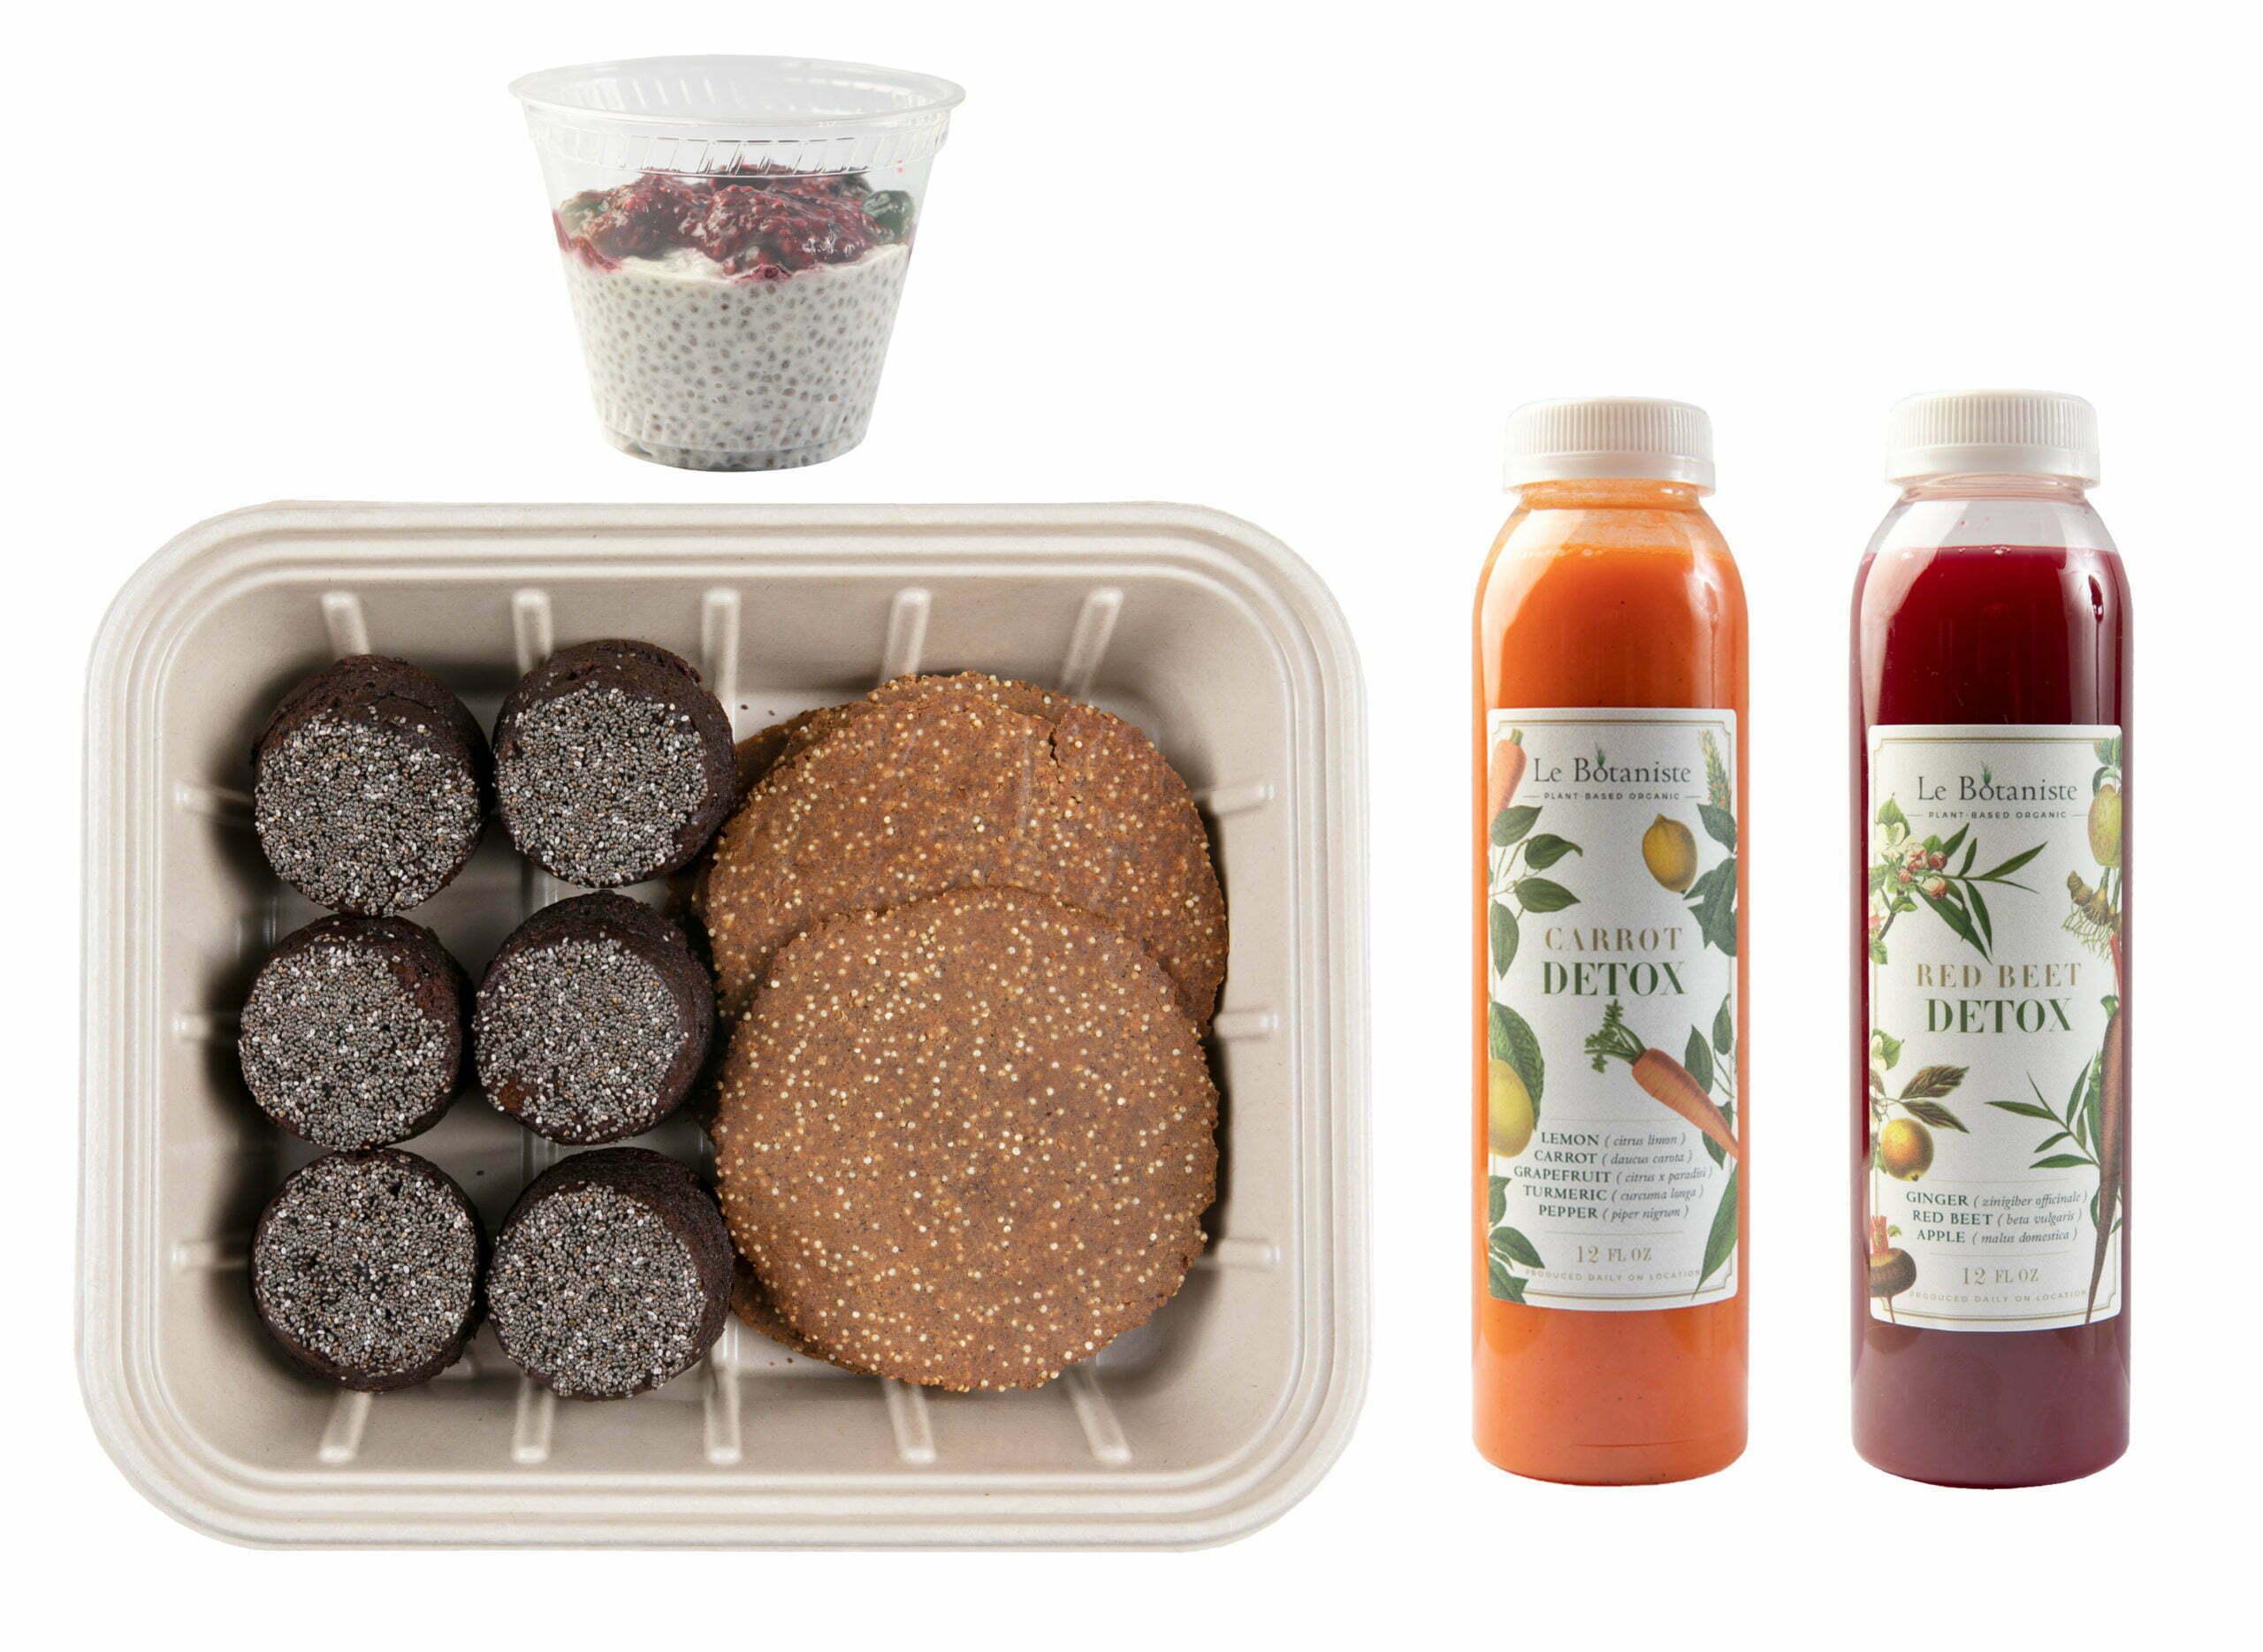 Le Botaniste Catering Guilt-Free Snack